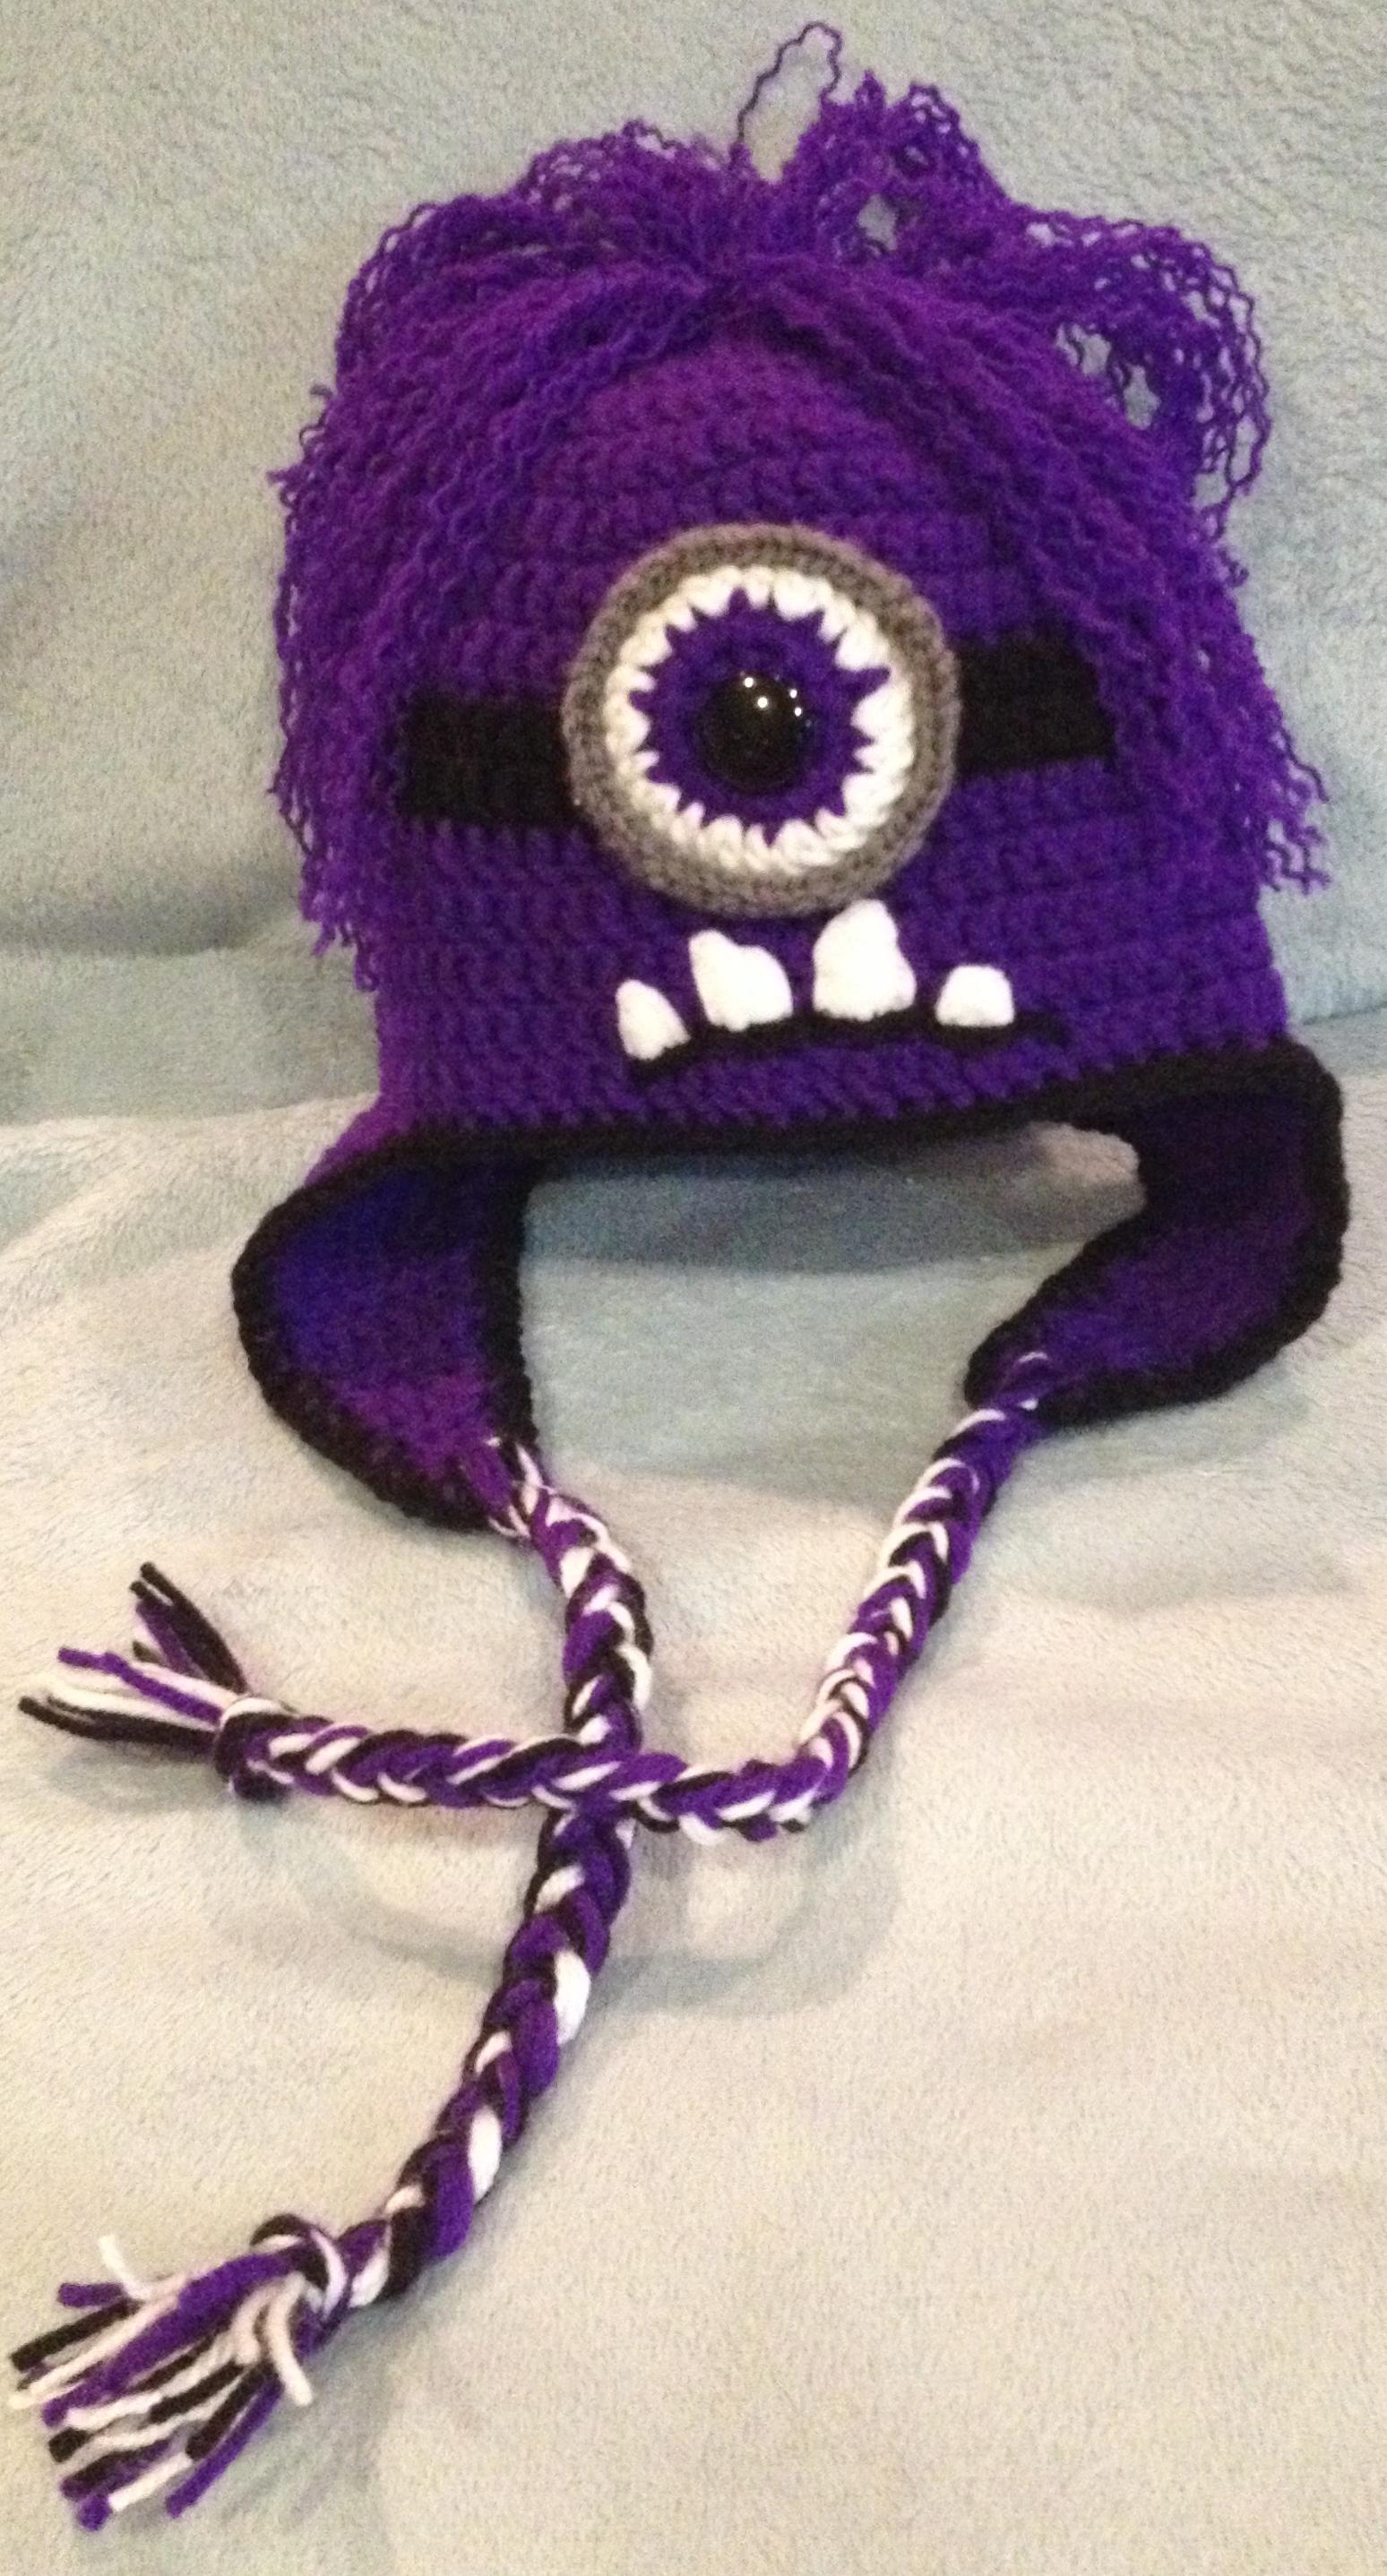 Free Crochet Pattern For Minion Hat With Ear Flaps : Super Cute Child S One Eye Evil Minion Hat Beanie W Ear ...